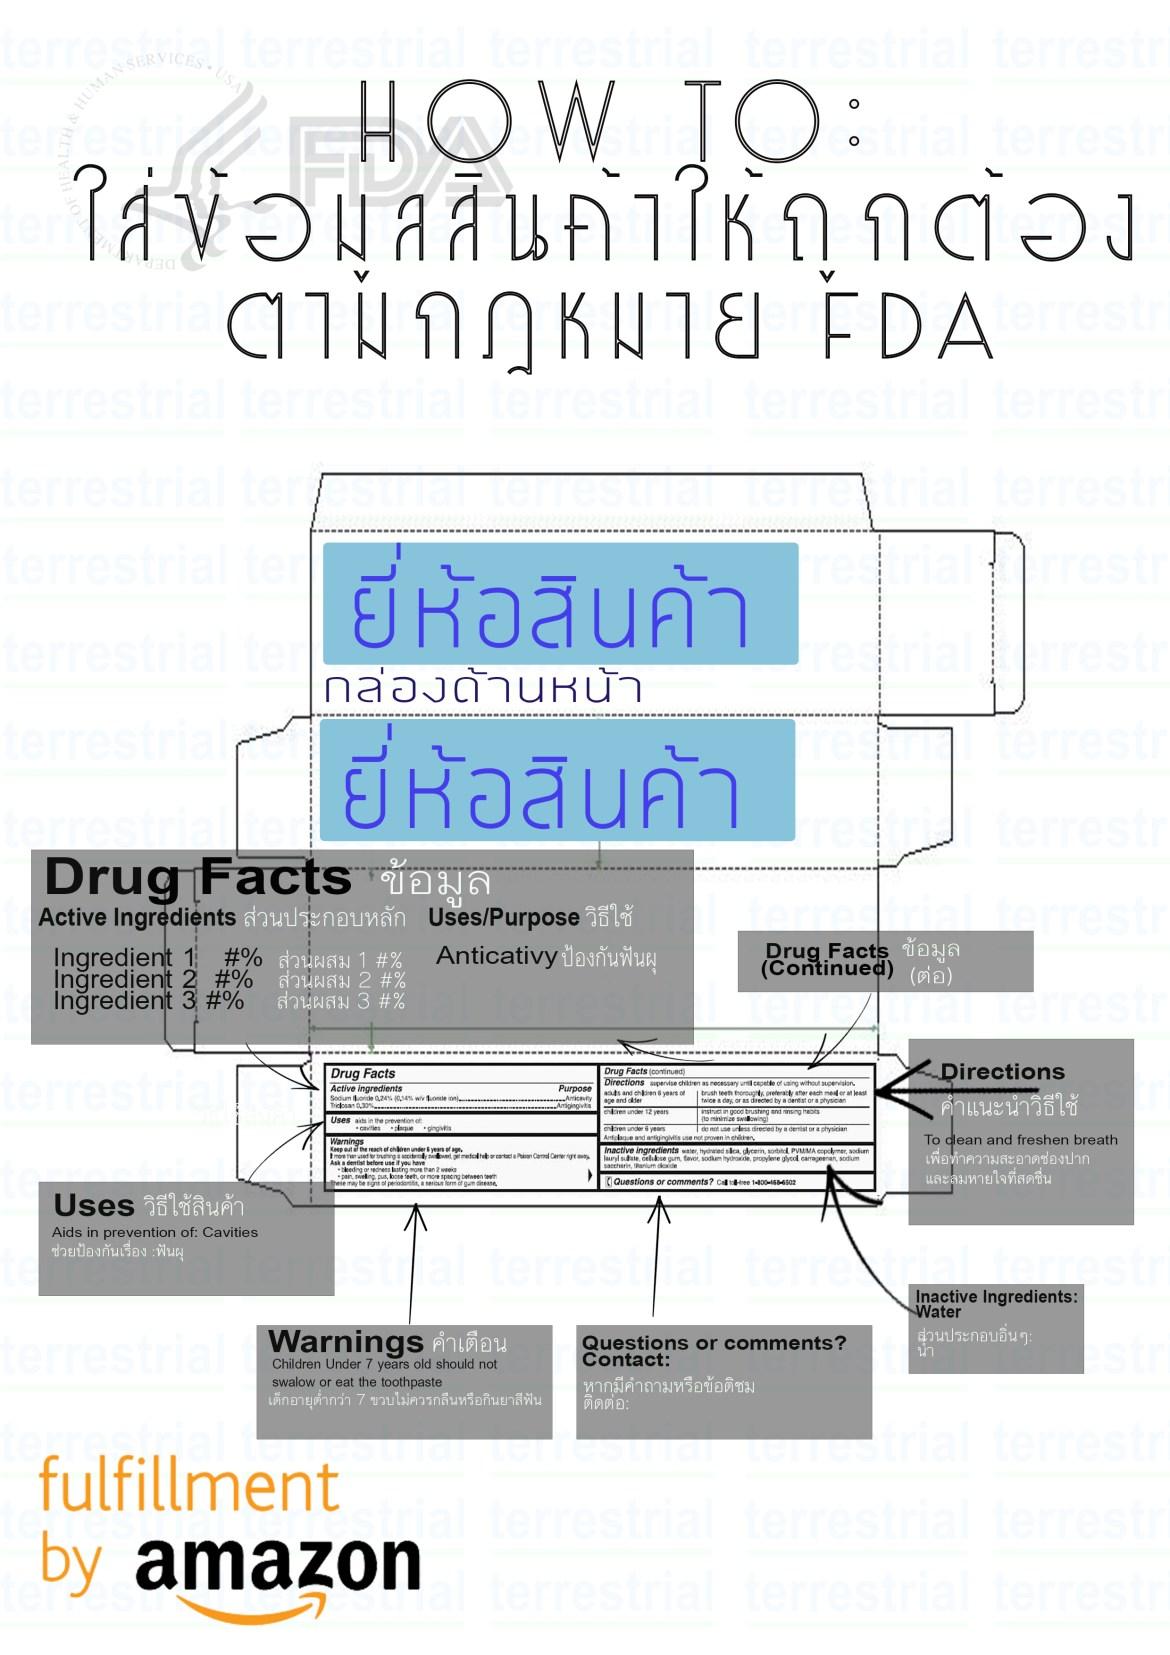 FDA Toothpaste.jpg